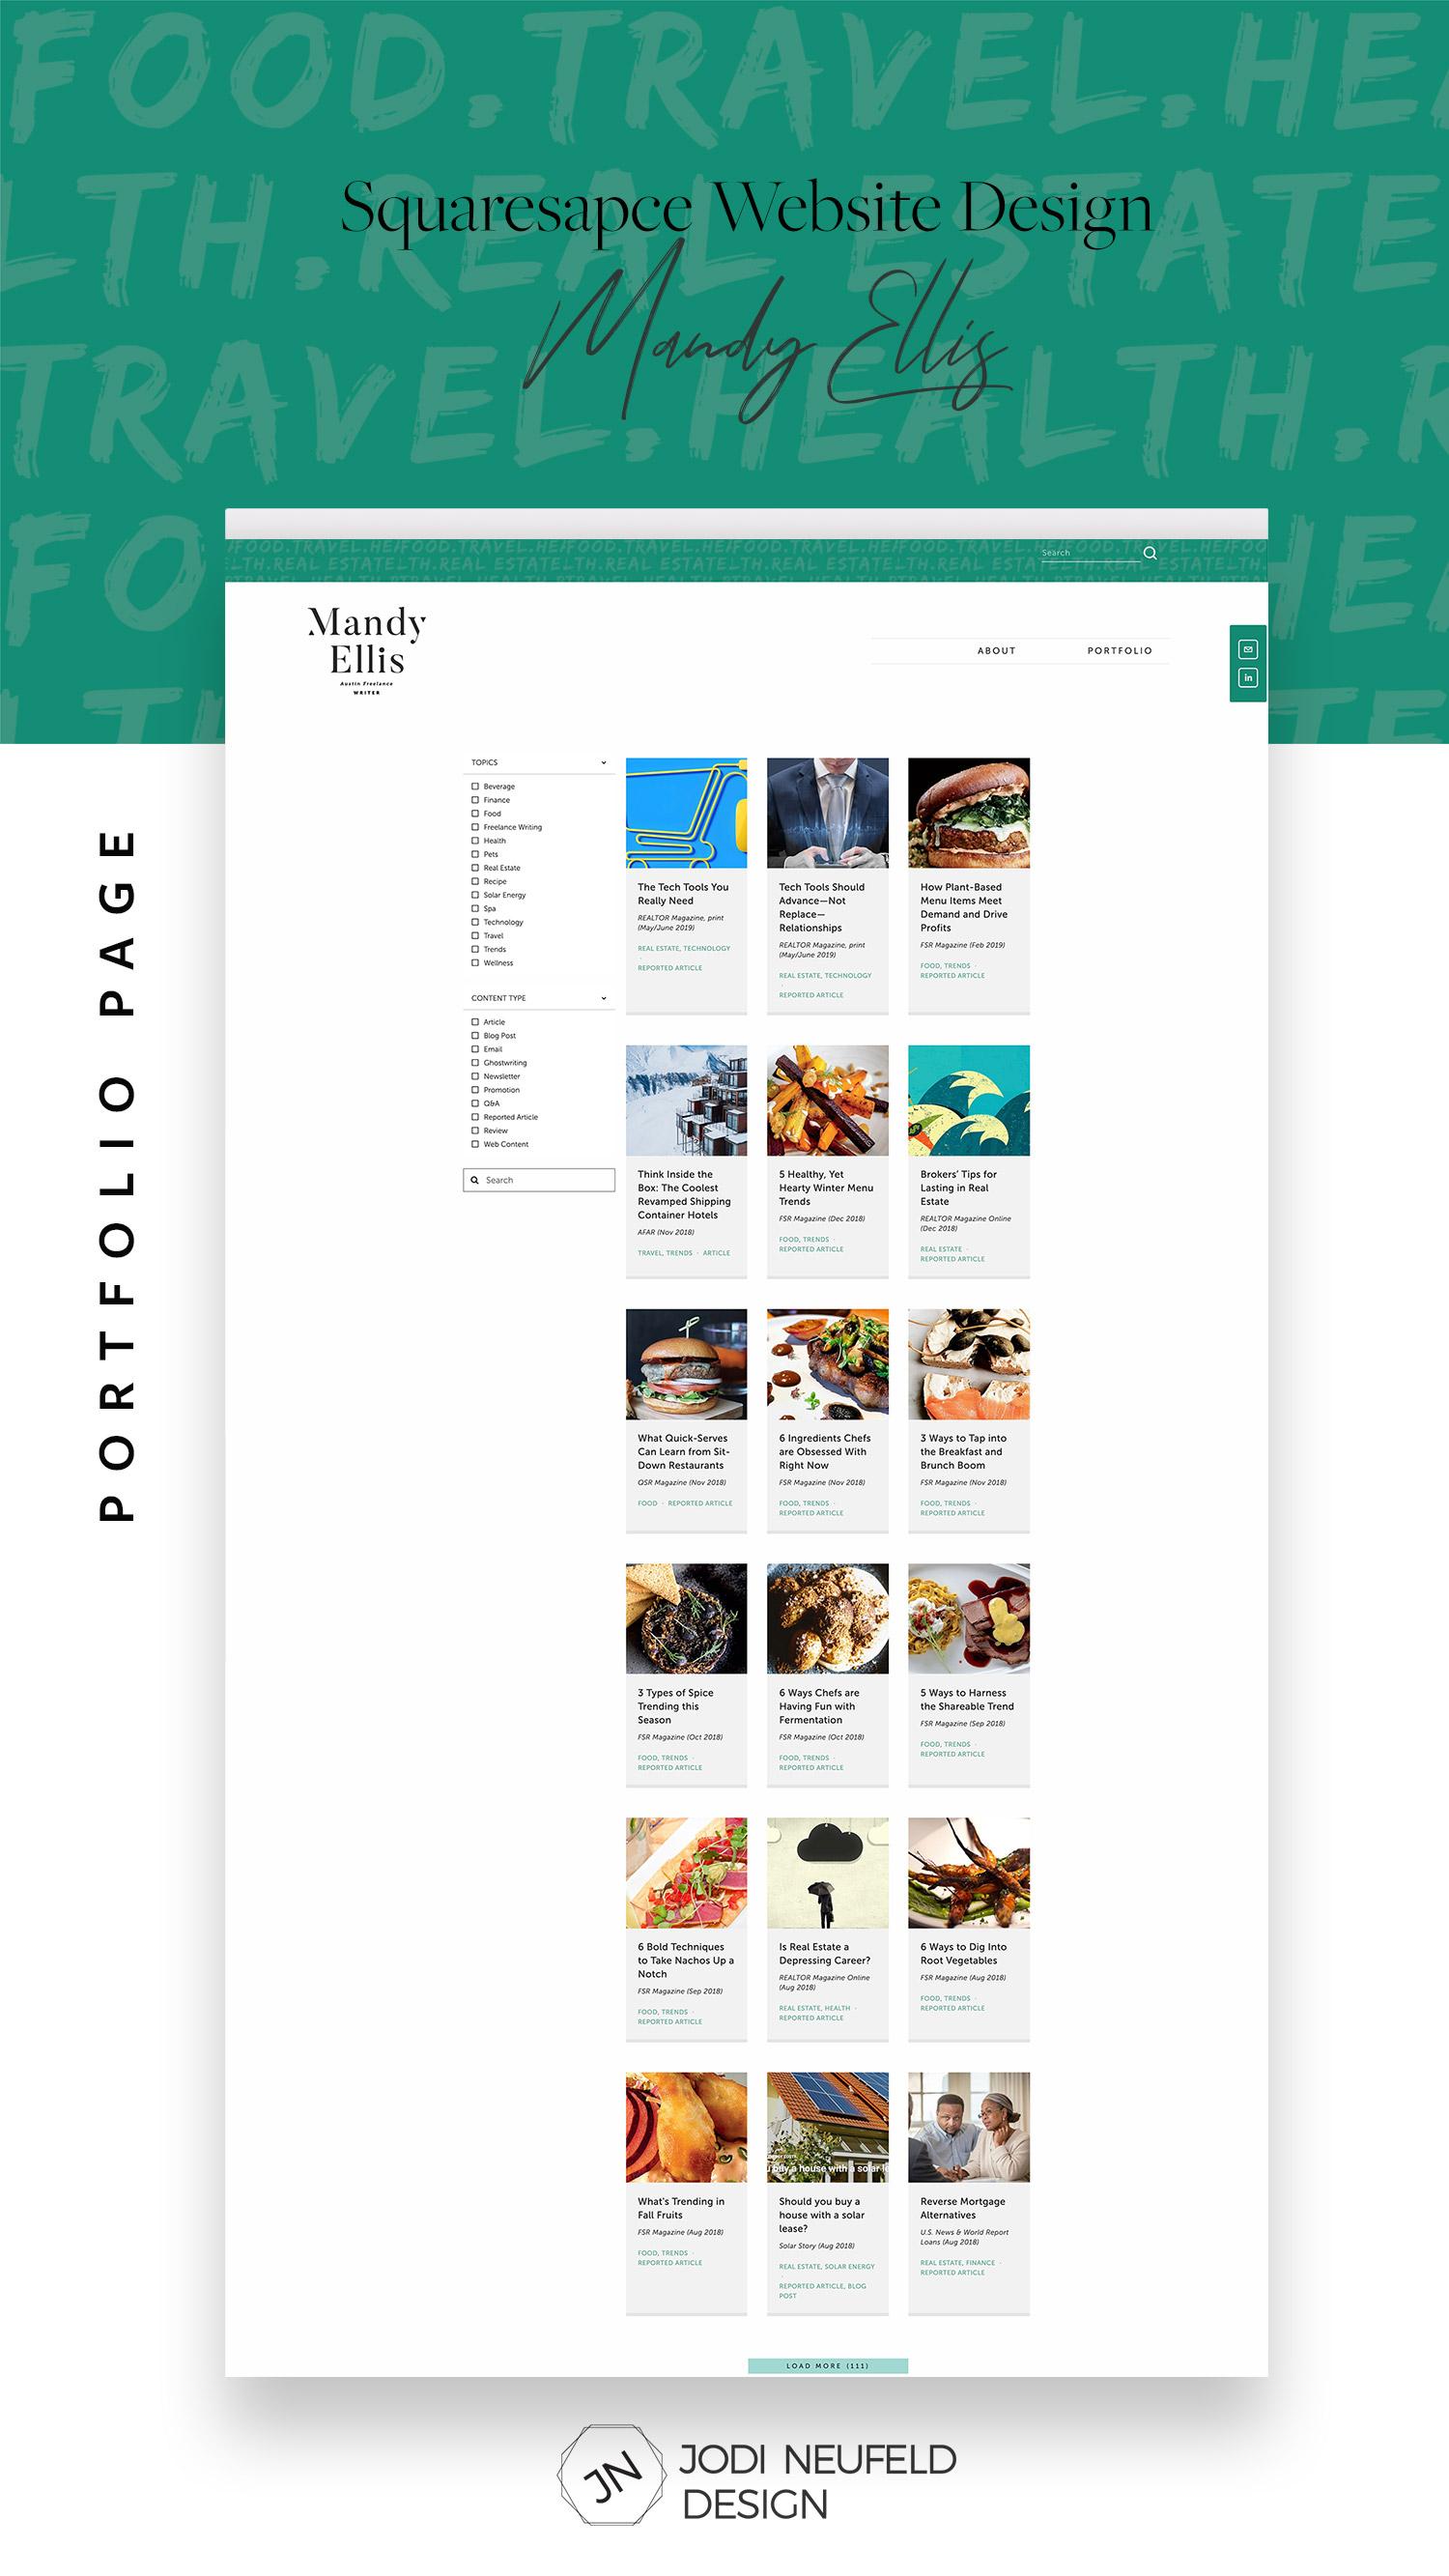 Mandy Ellis freelance writer | Interactive writing portfolio | webdesign by Jodi Neufeld Design #squarespace #webdesigner